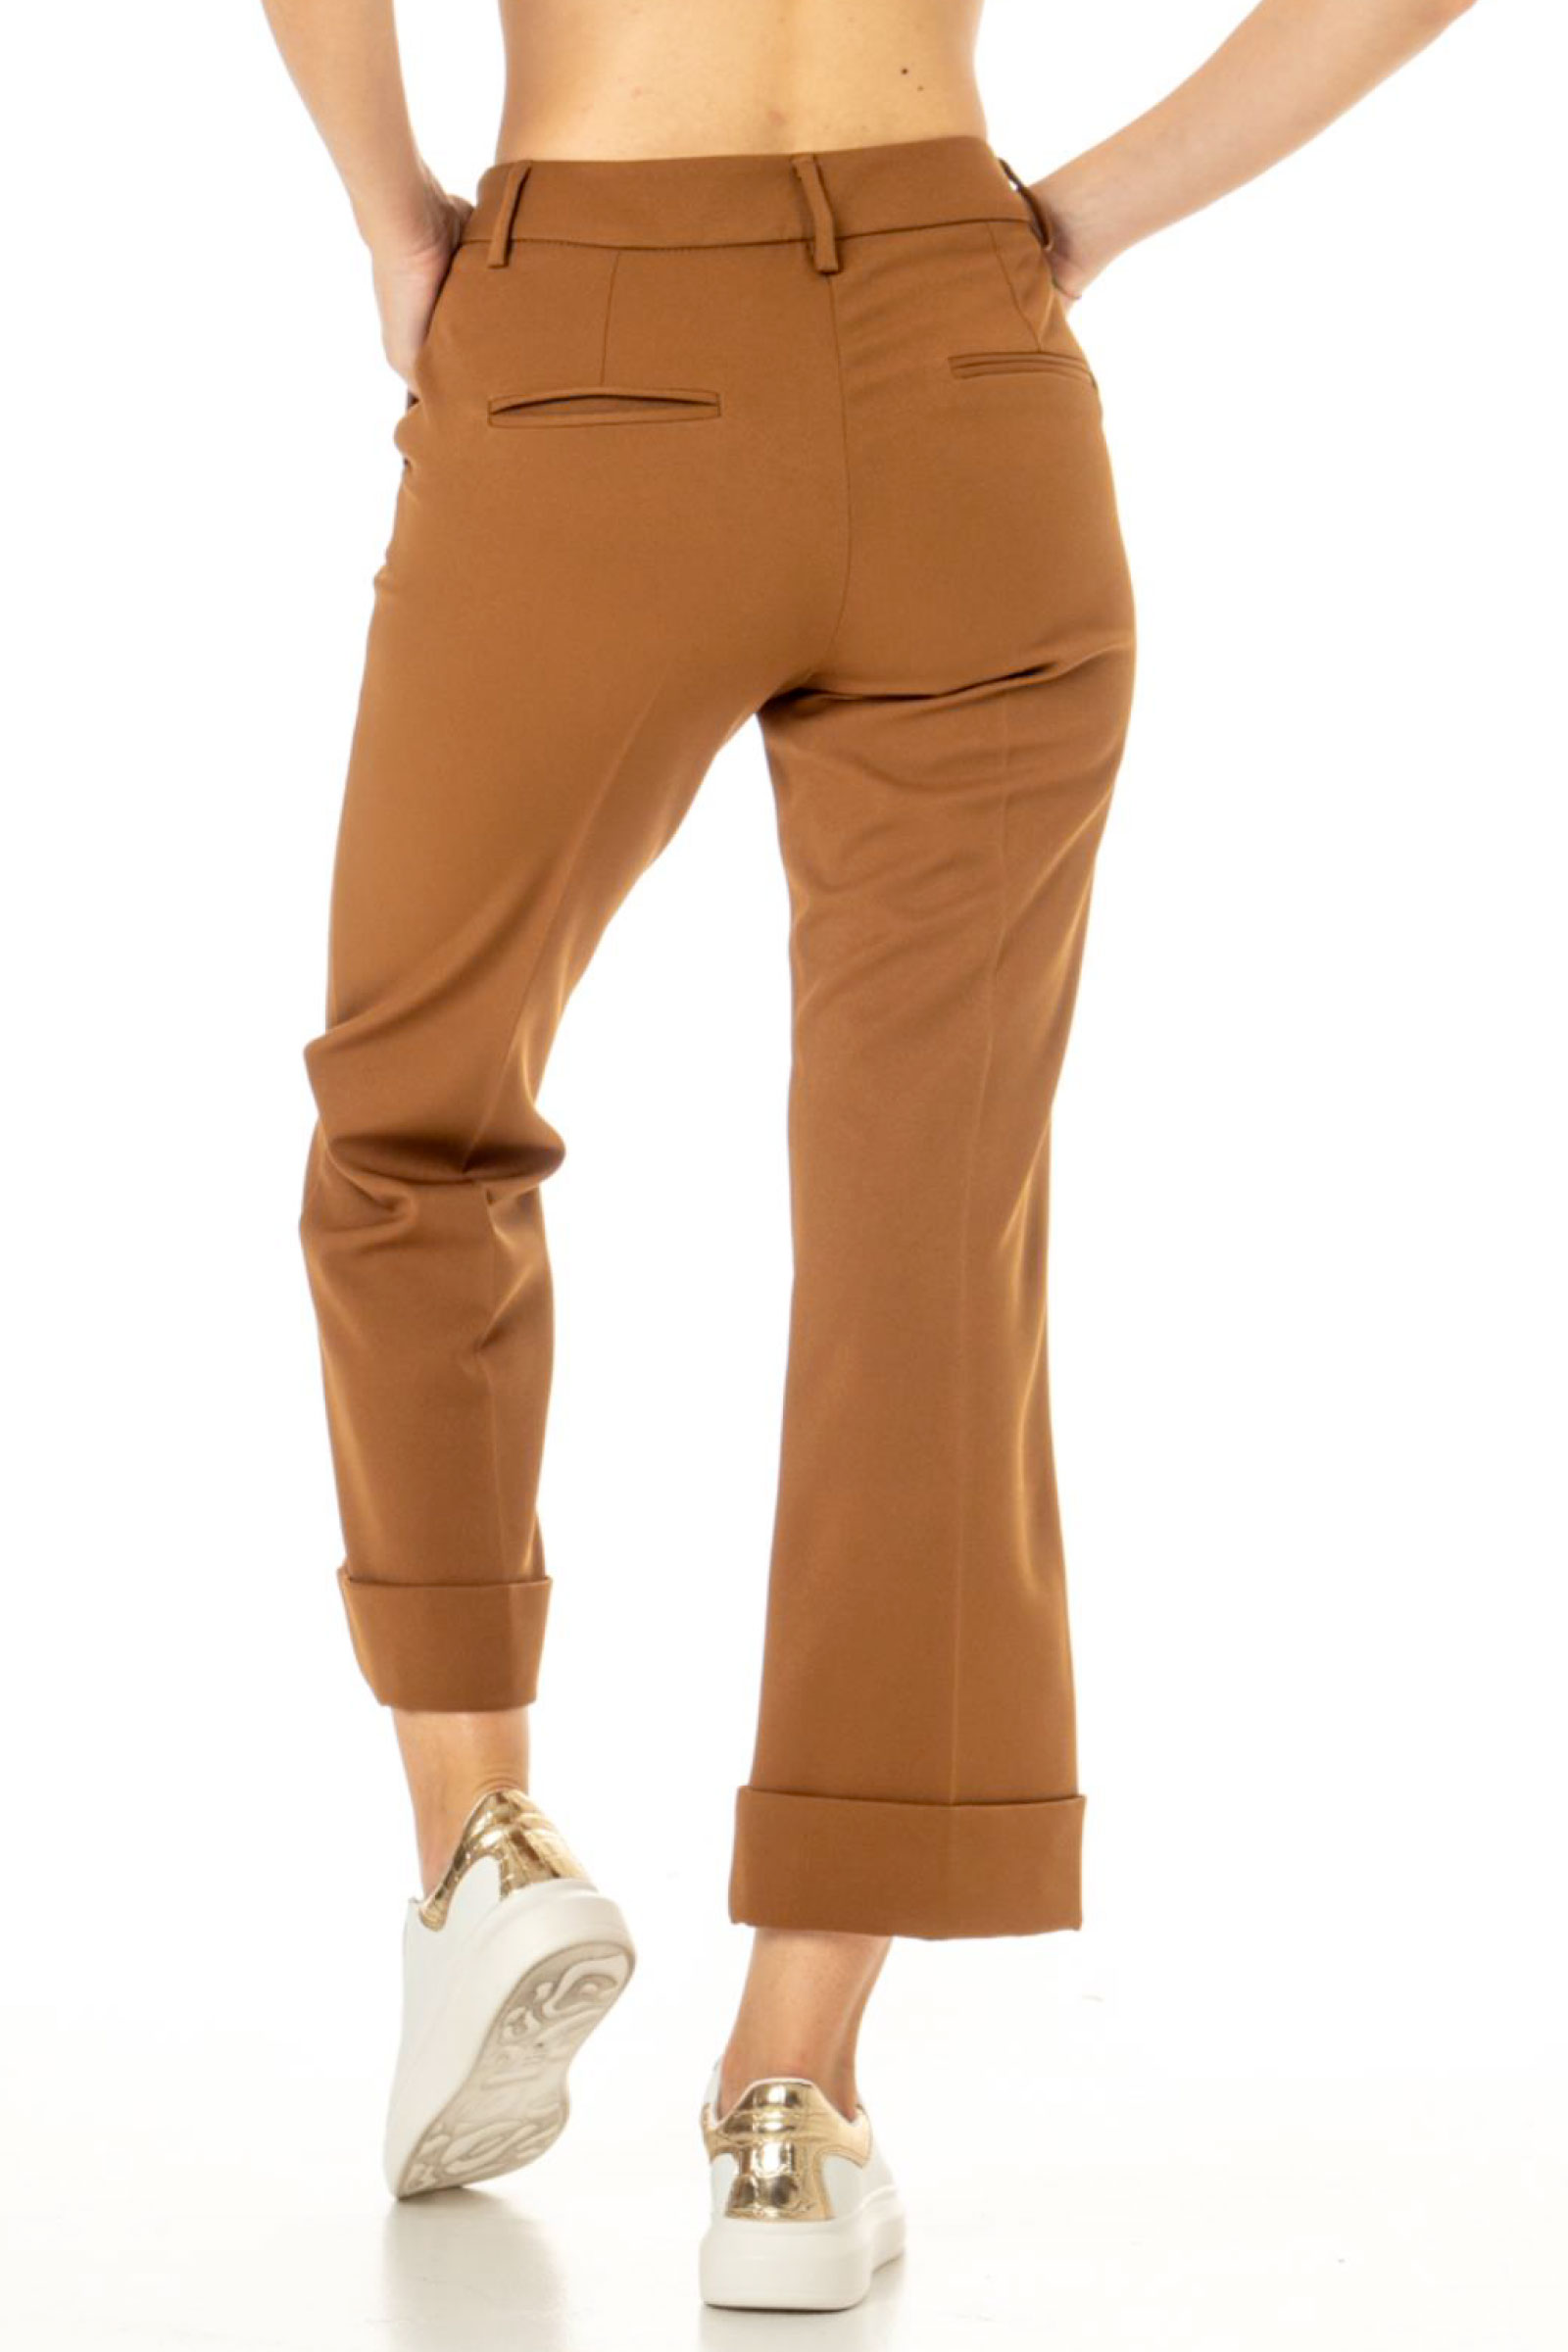 Pantalone Donna Modello VALLET EMME MARELLA   Pantalone   51360819200002